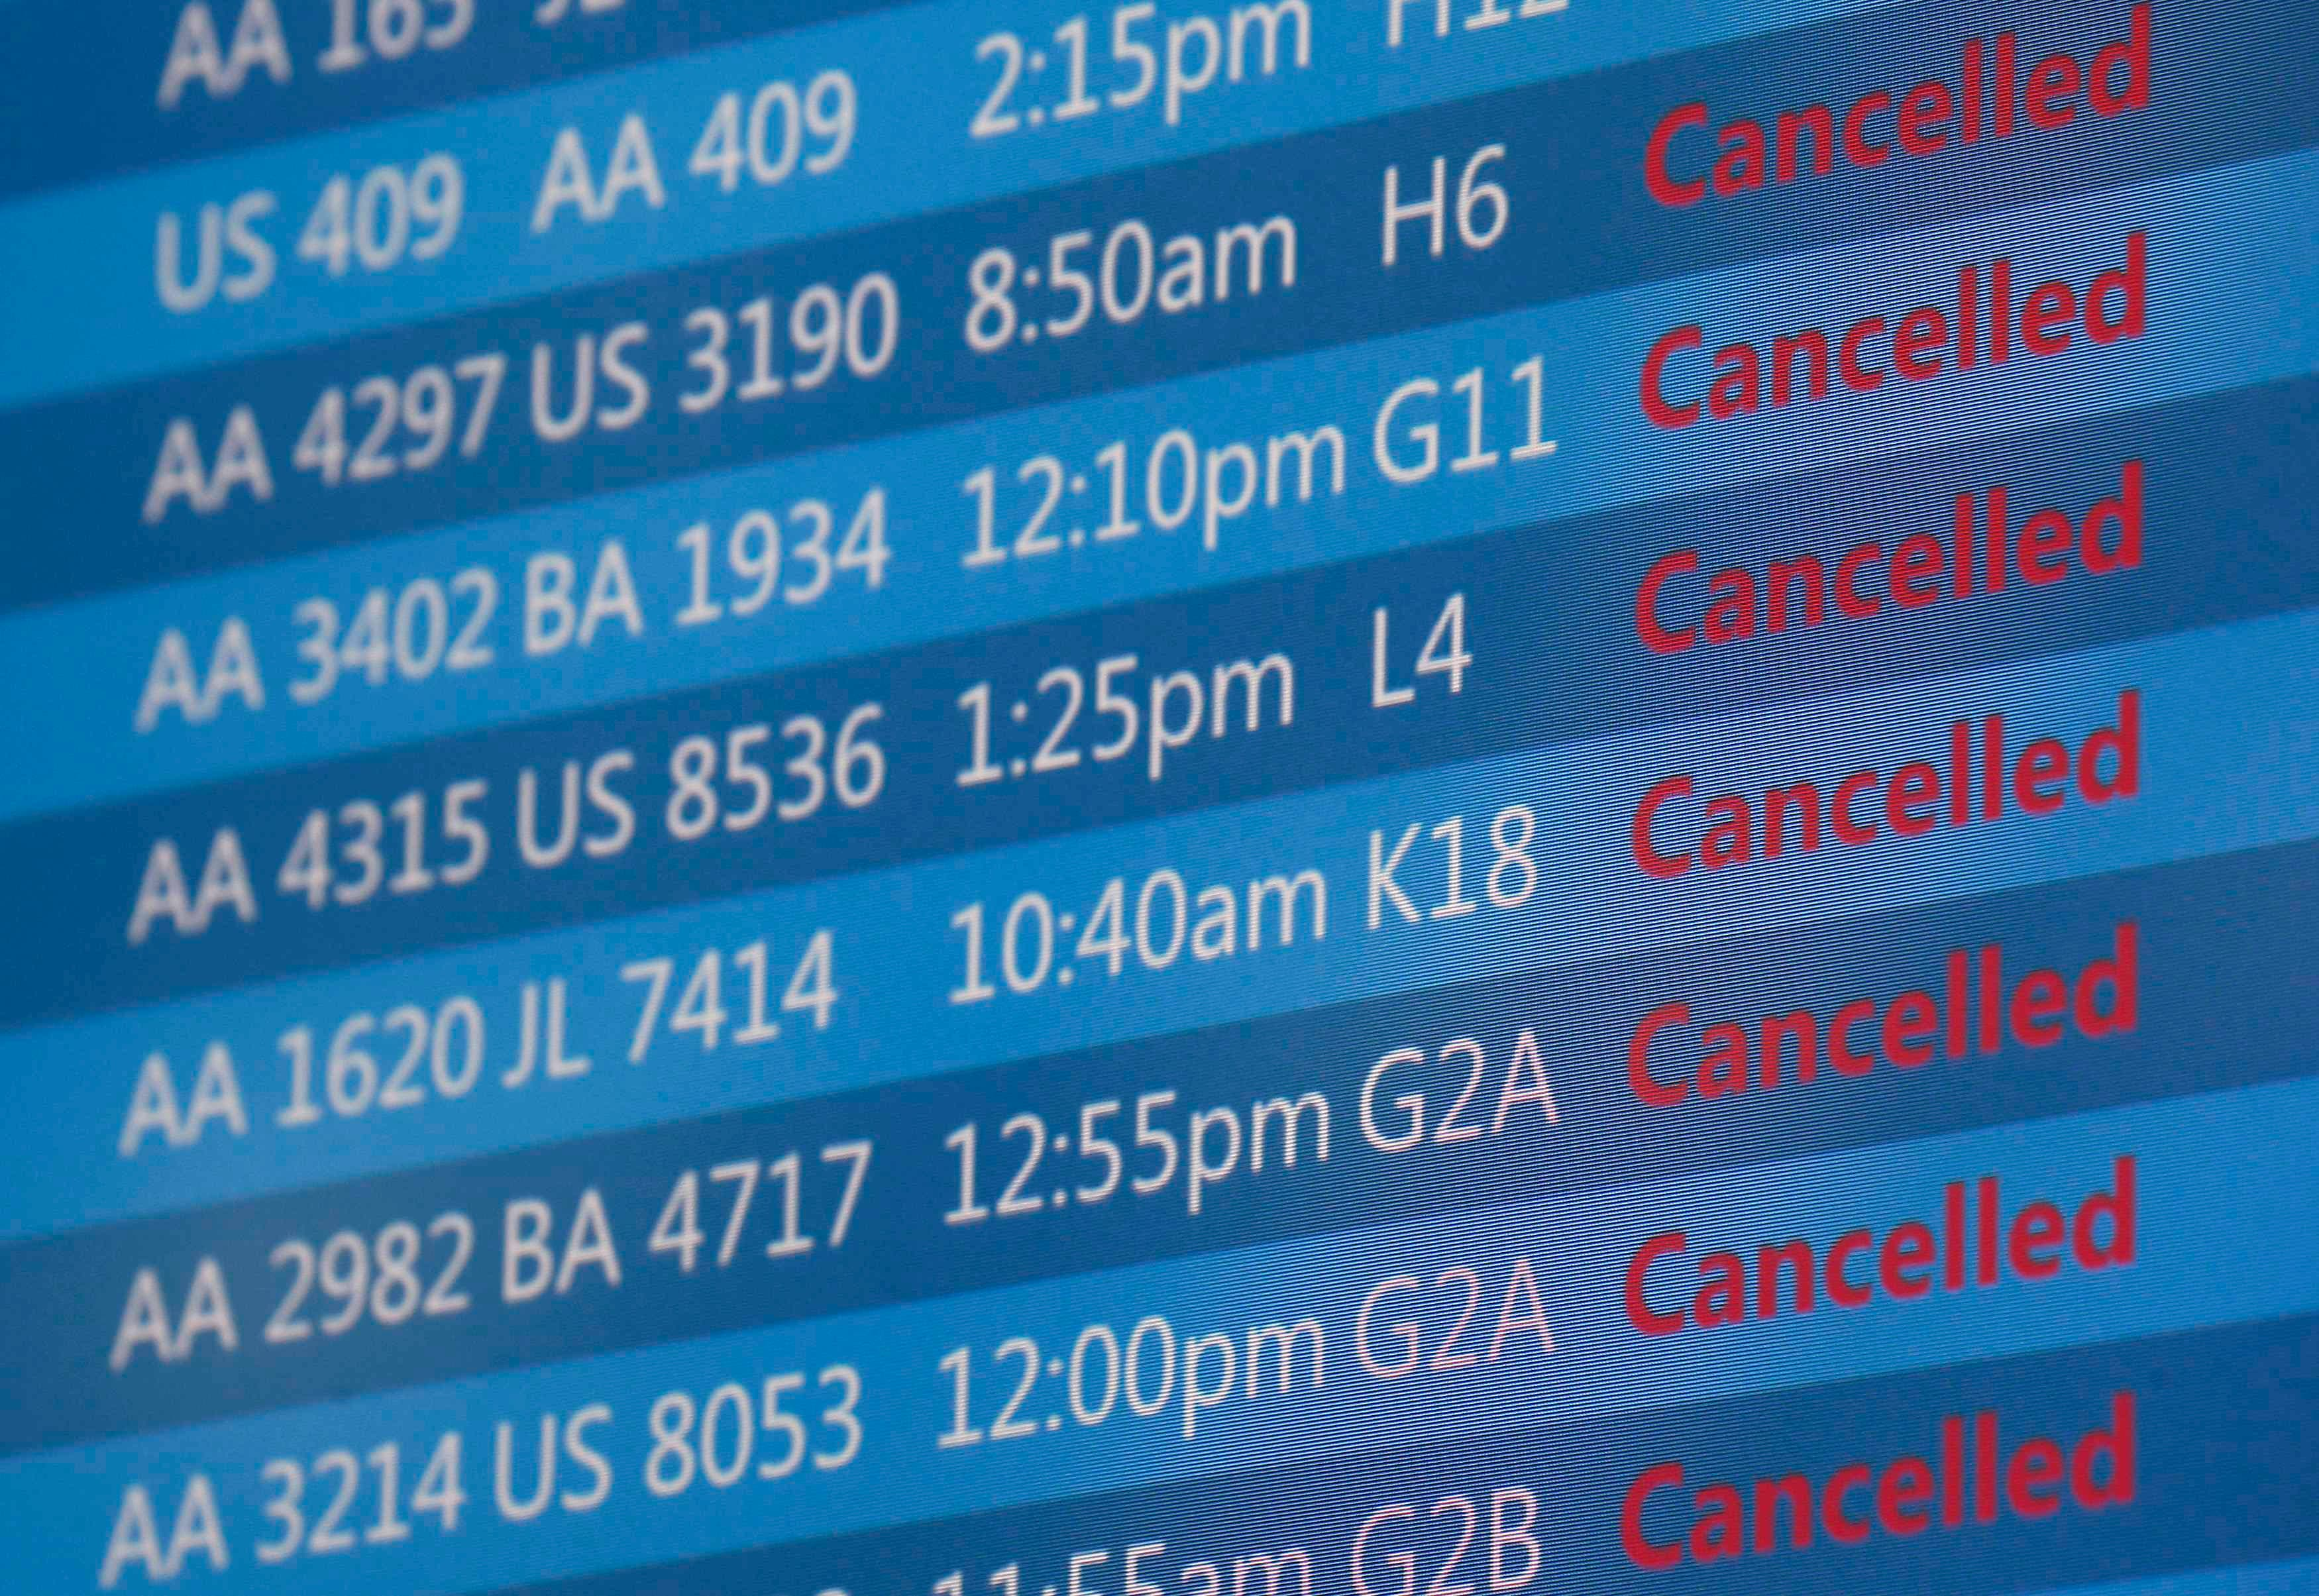 الغاء رحلات مطار شيكاغو